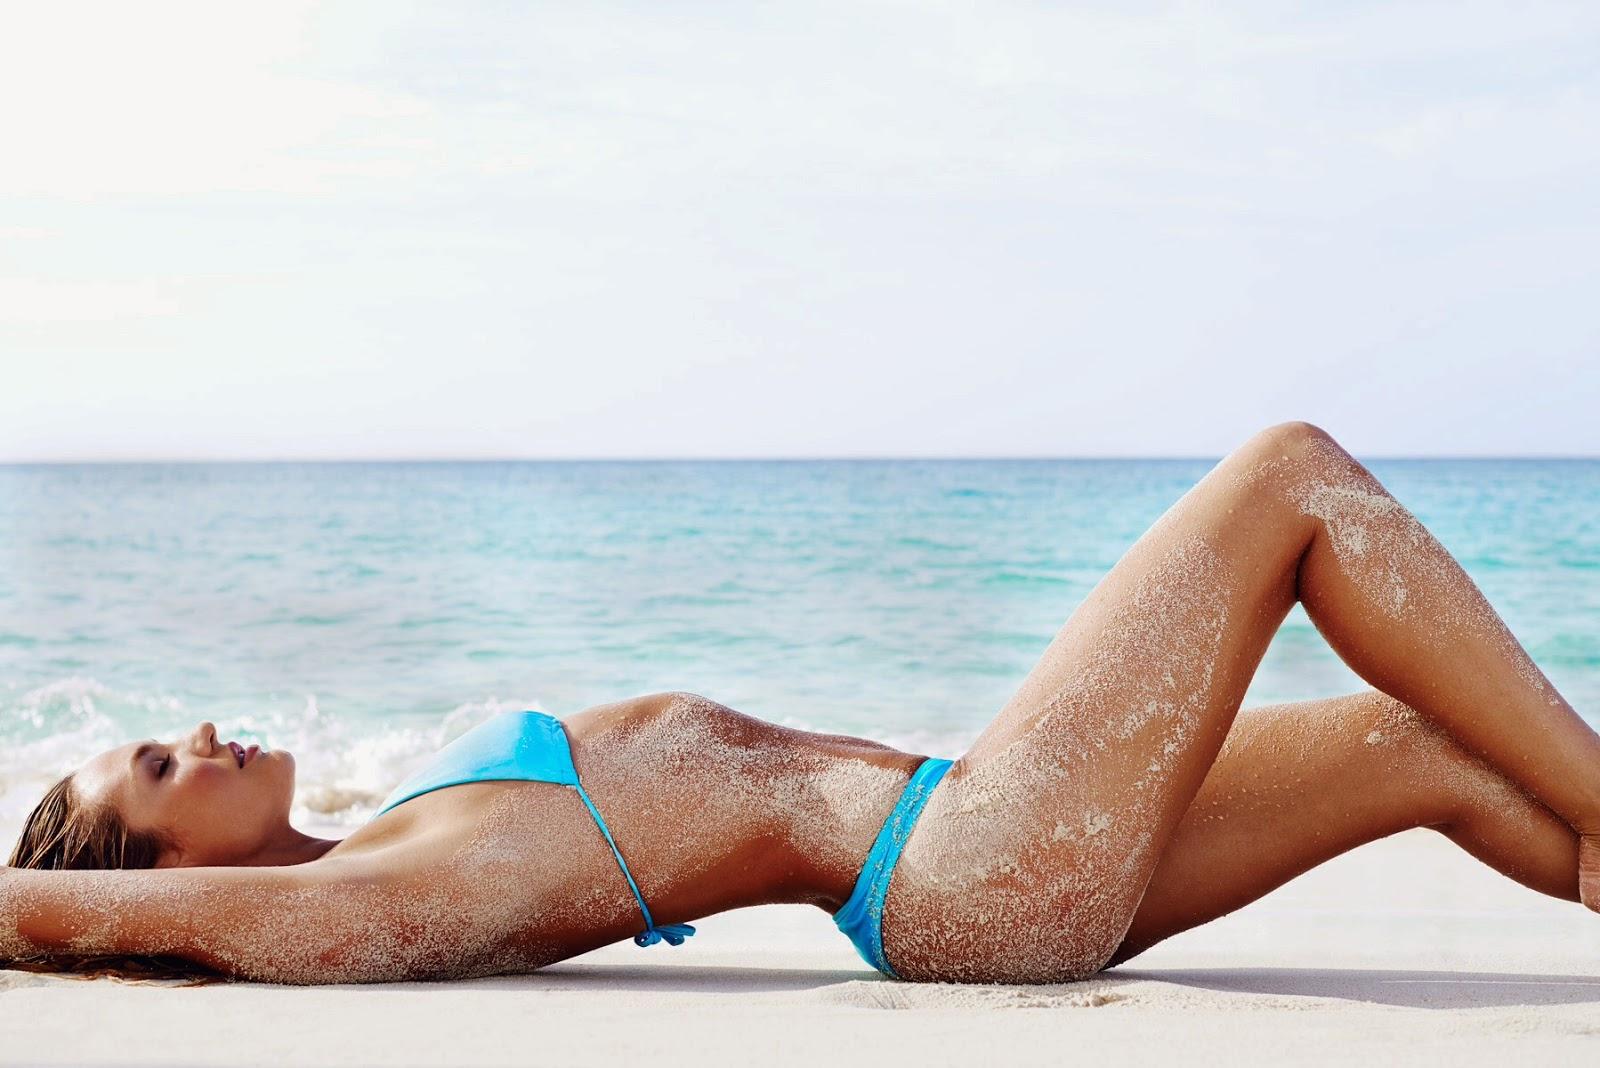 Candice-Swanepoel-Paola-Murray-Swimwear-1.jpg